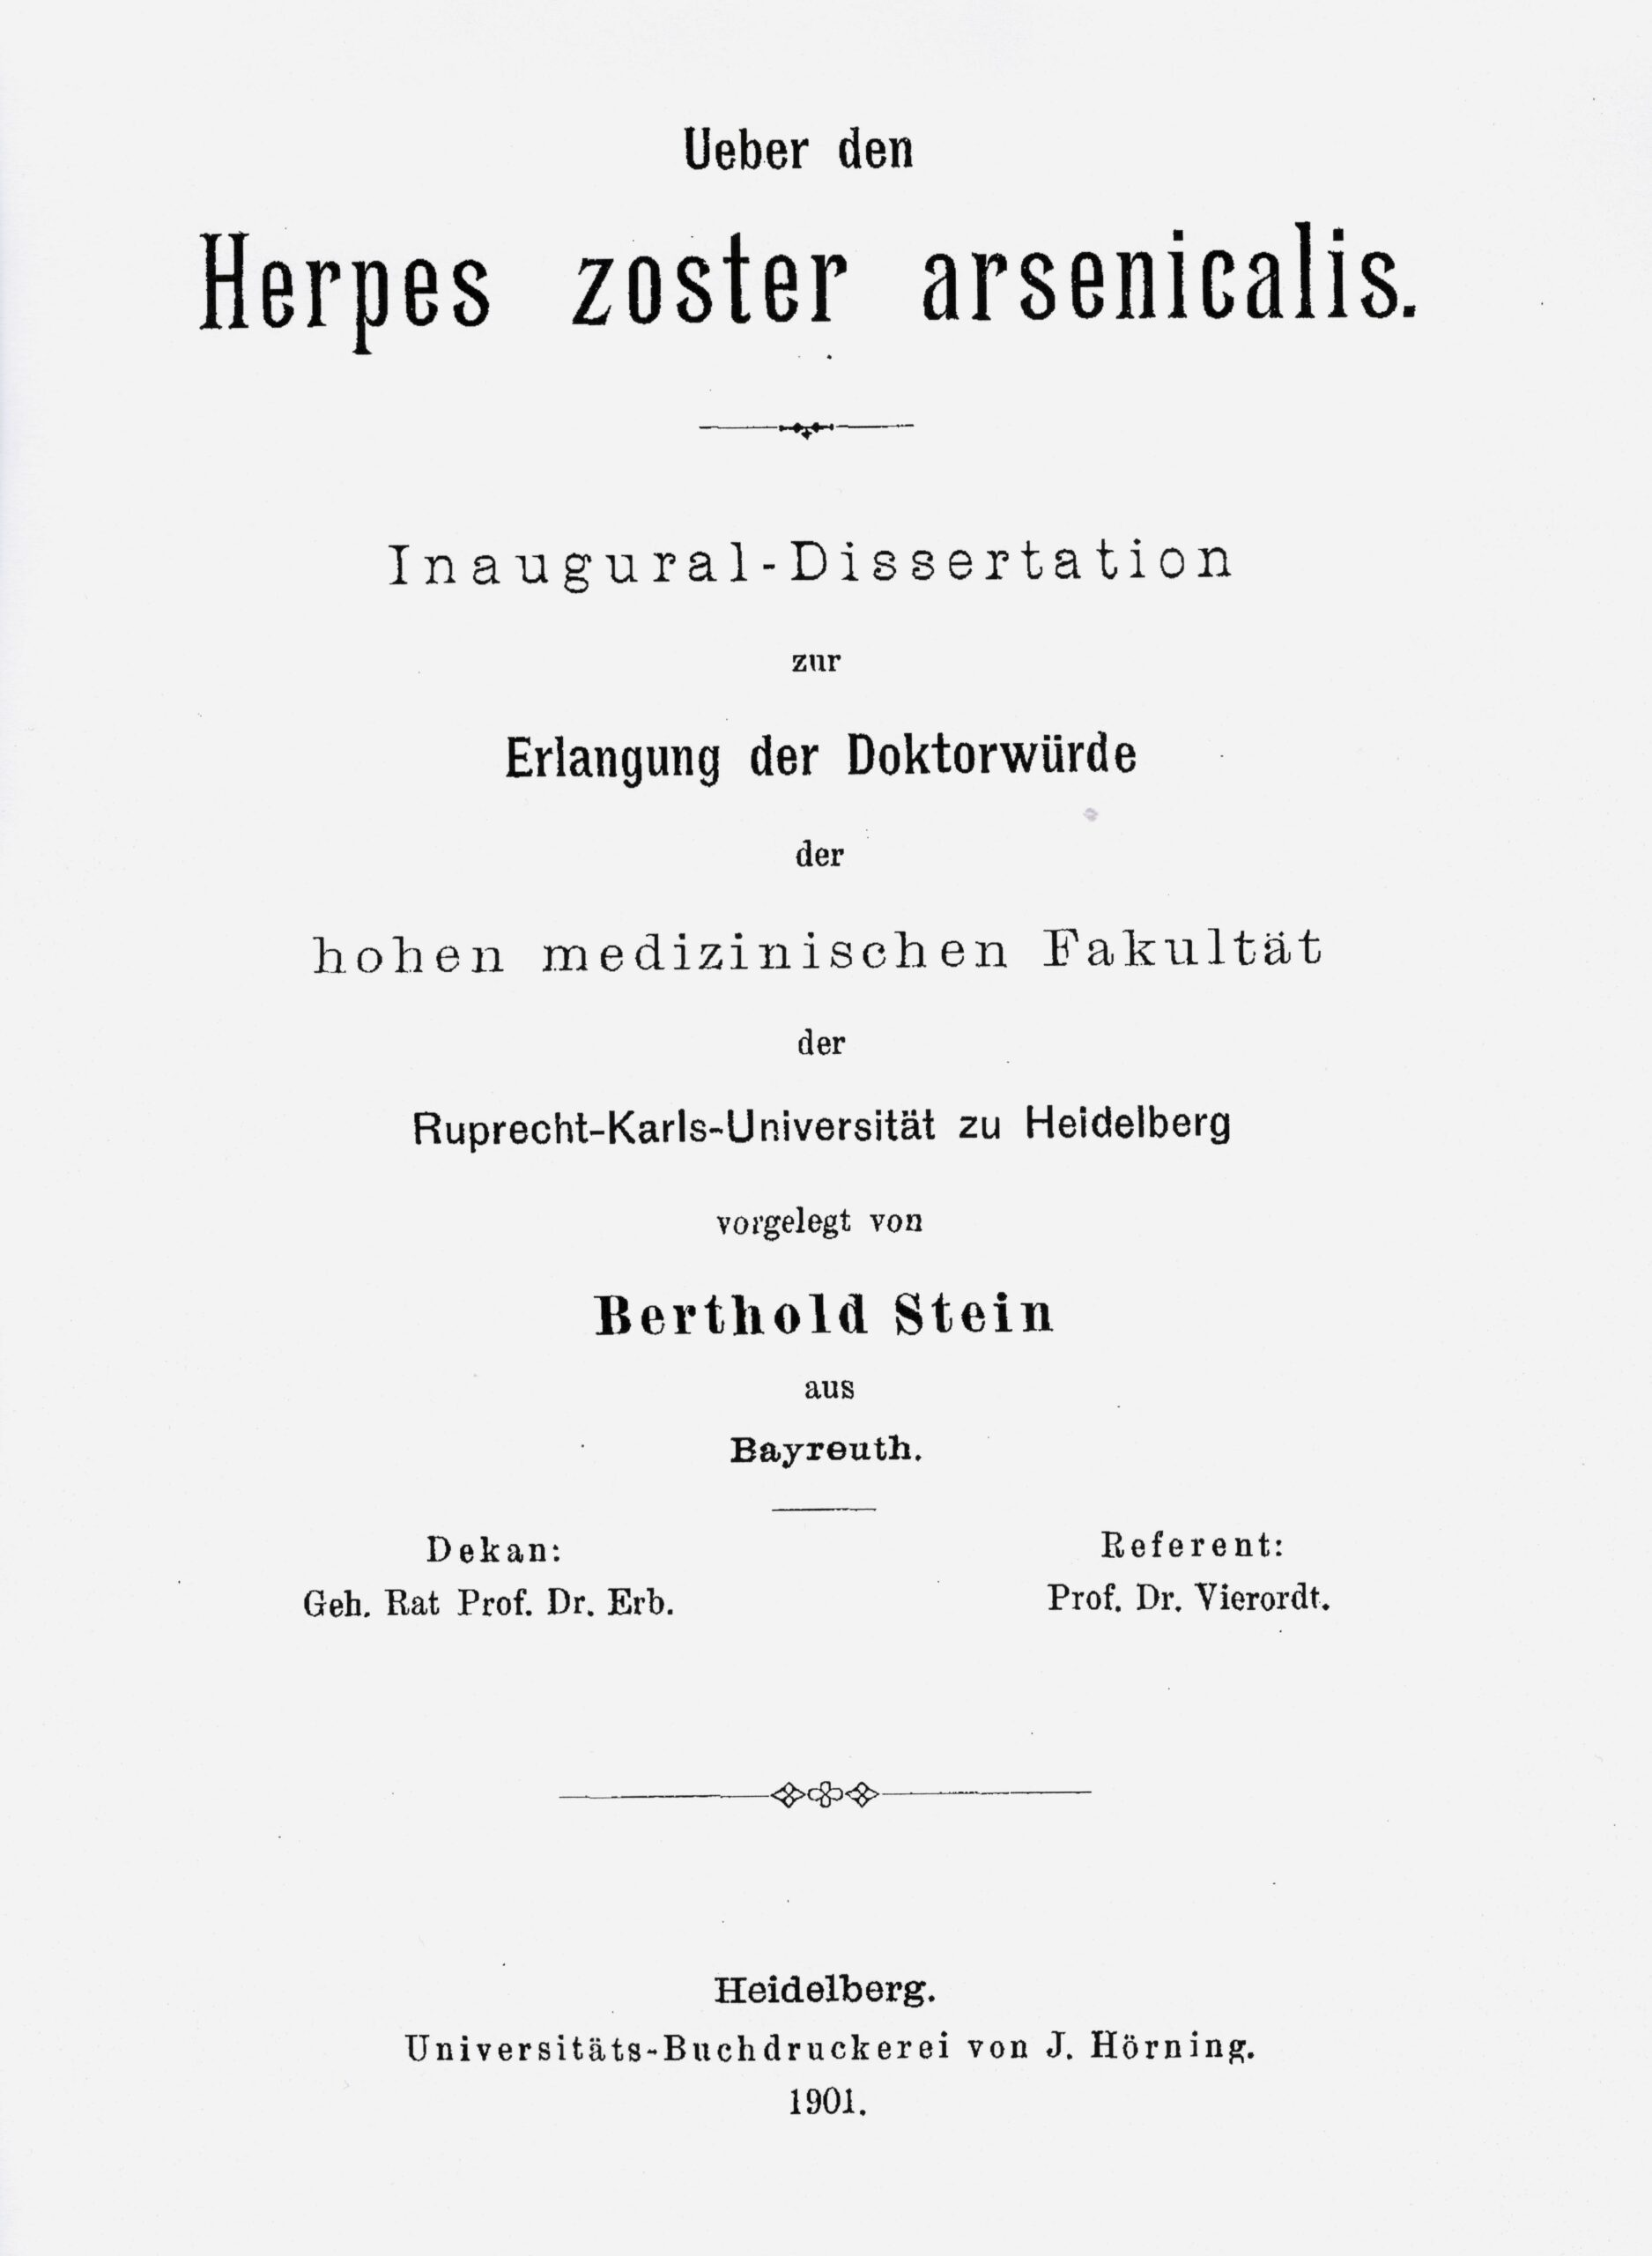 Dissertation, Heidelberg 1901